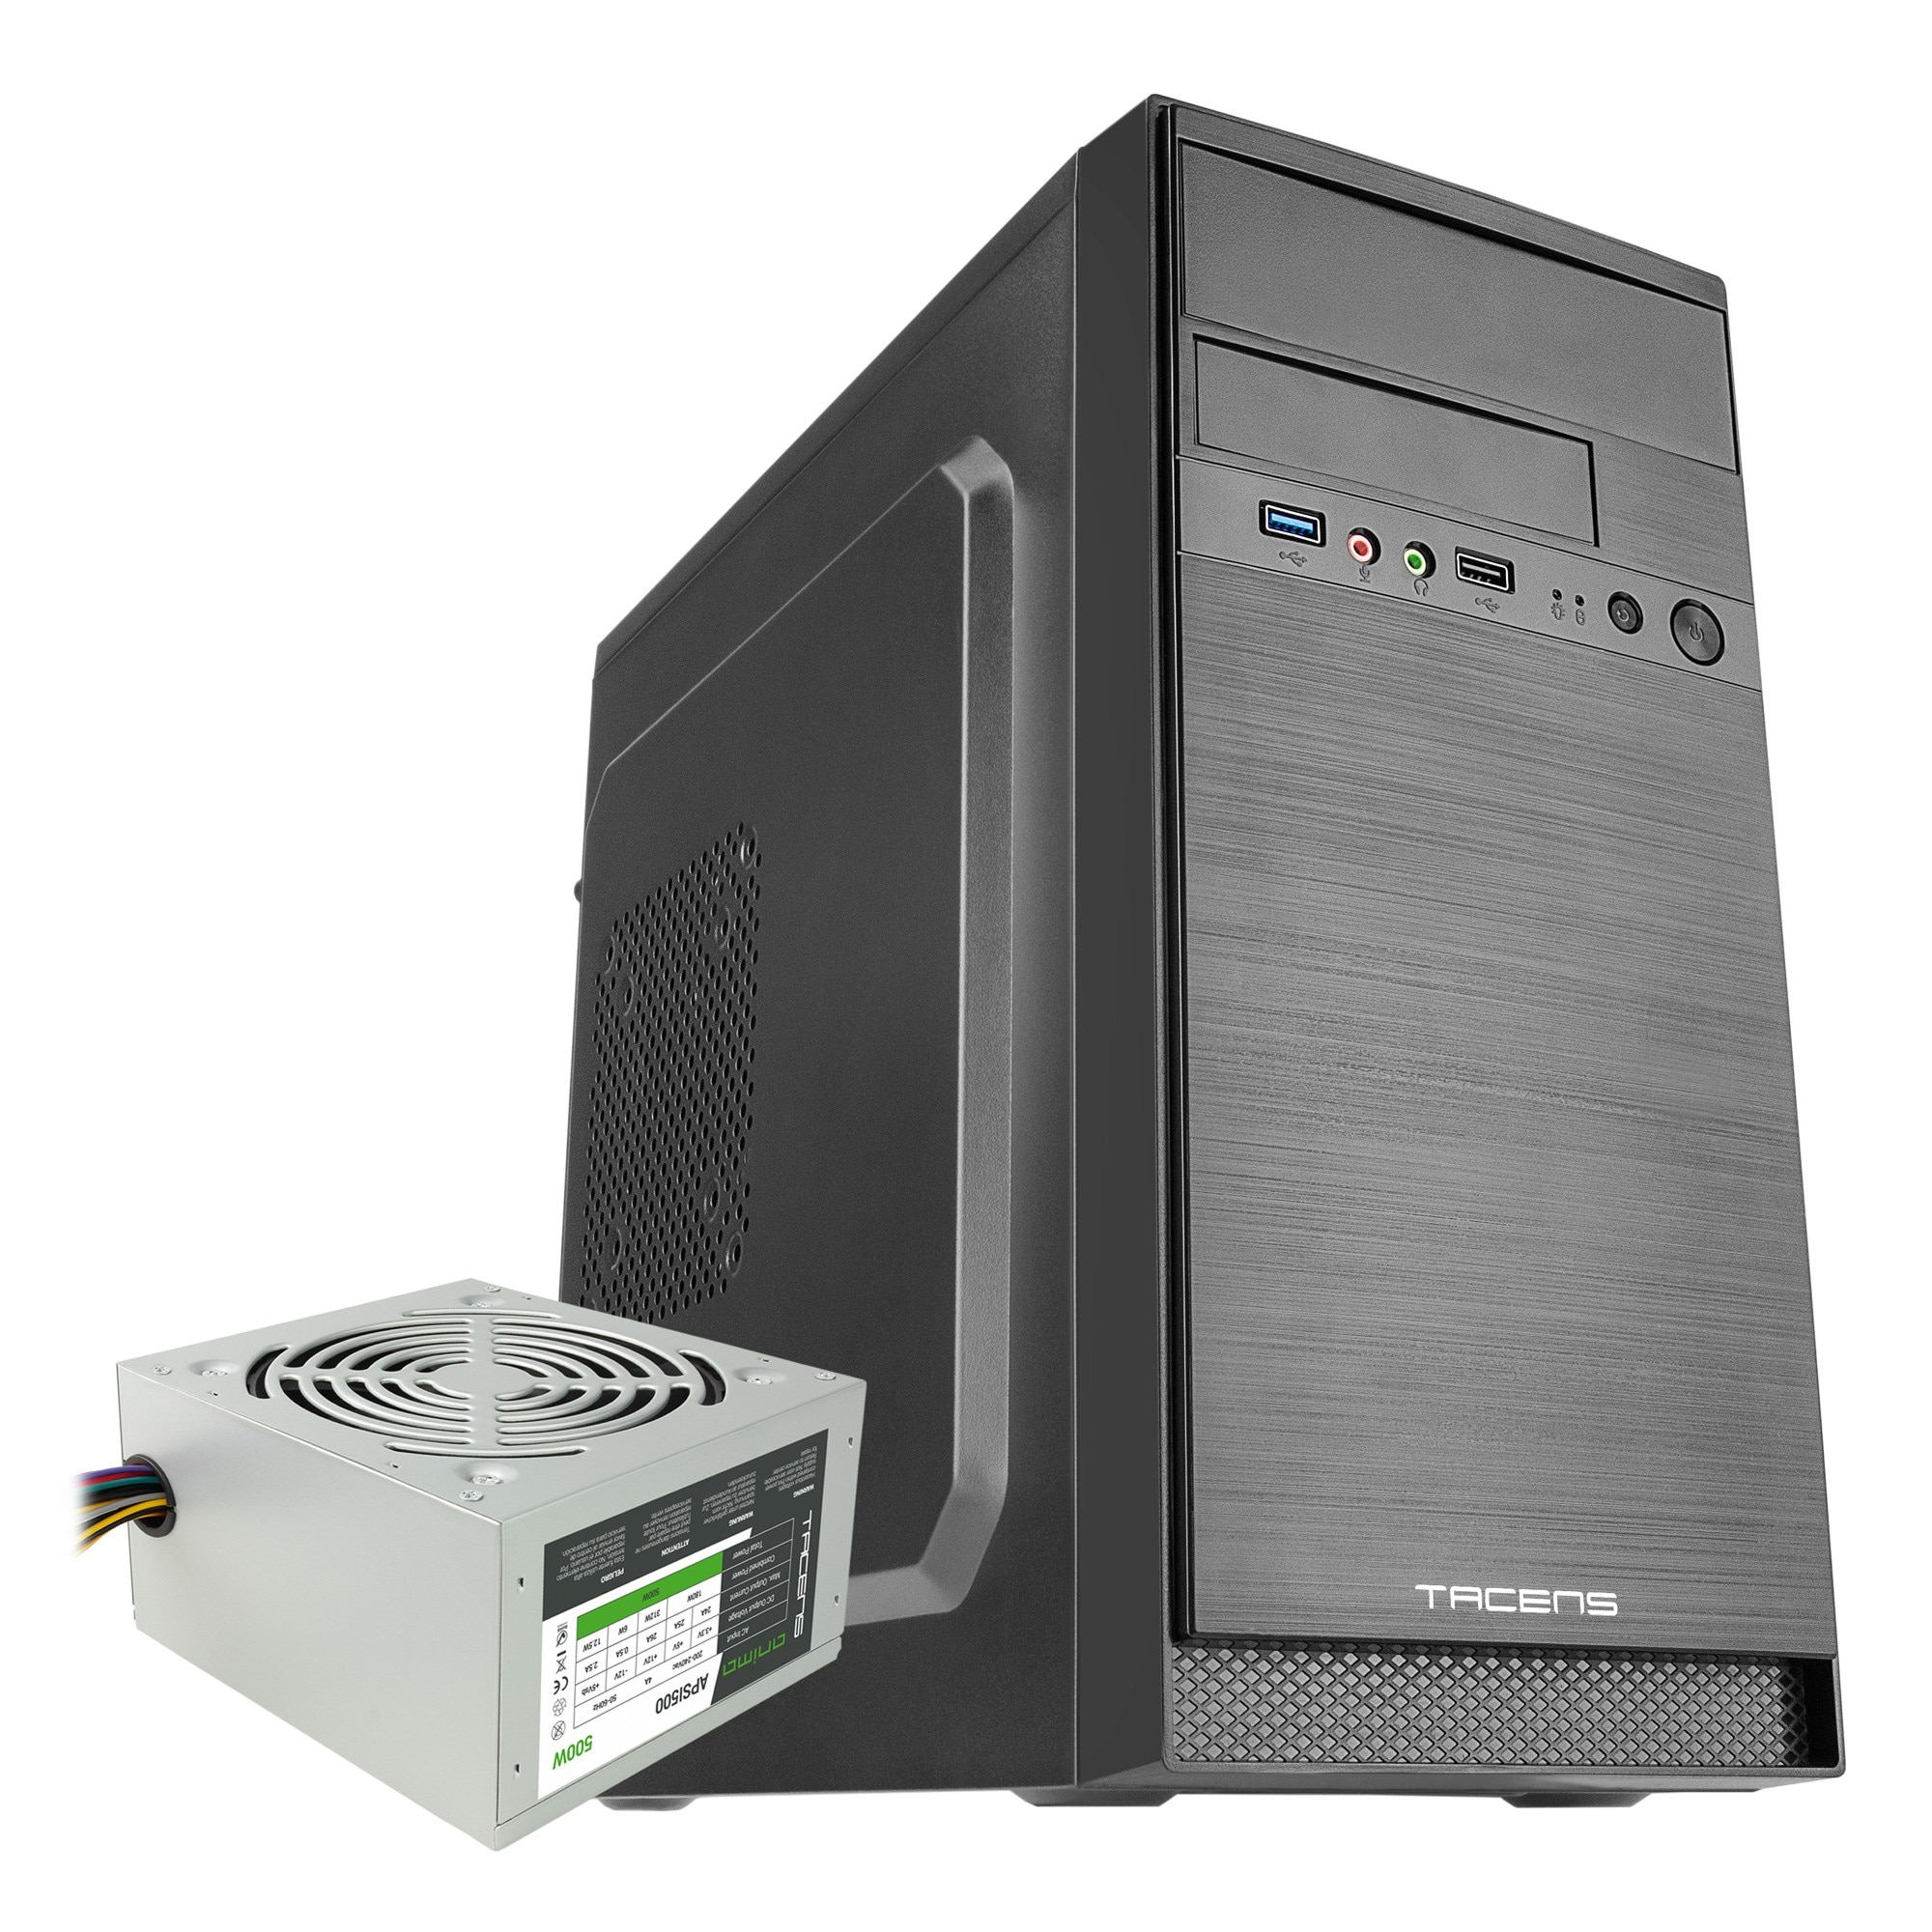 Tacens Anima AC4500, caja de PC + Fuente 500W, minitorre, MicroATX, acabado aluminio, USB 3.0